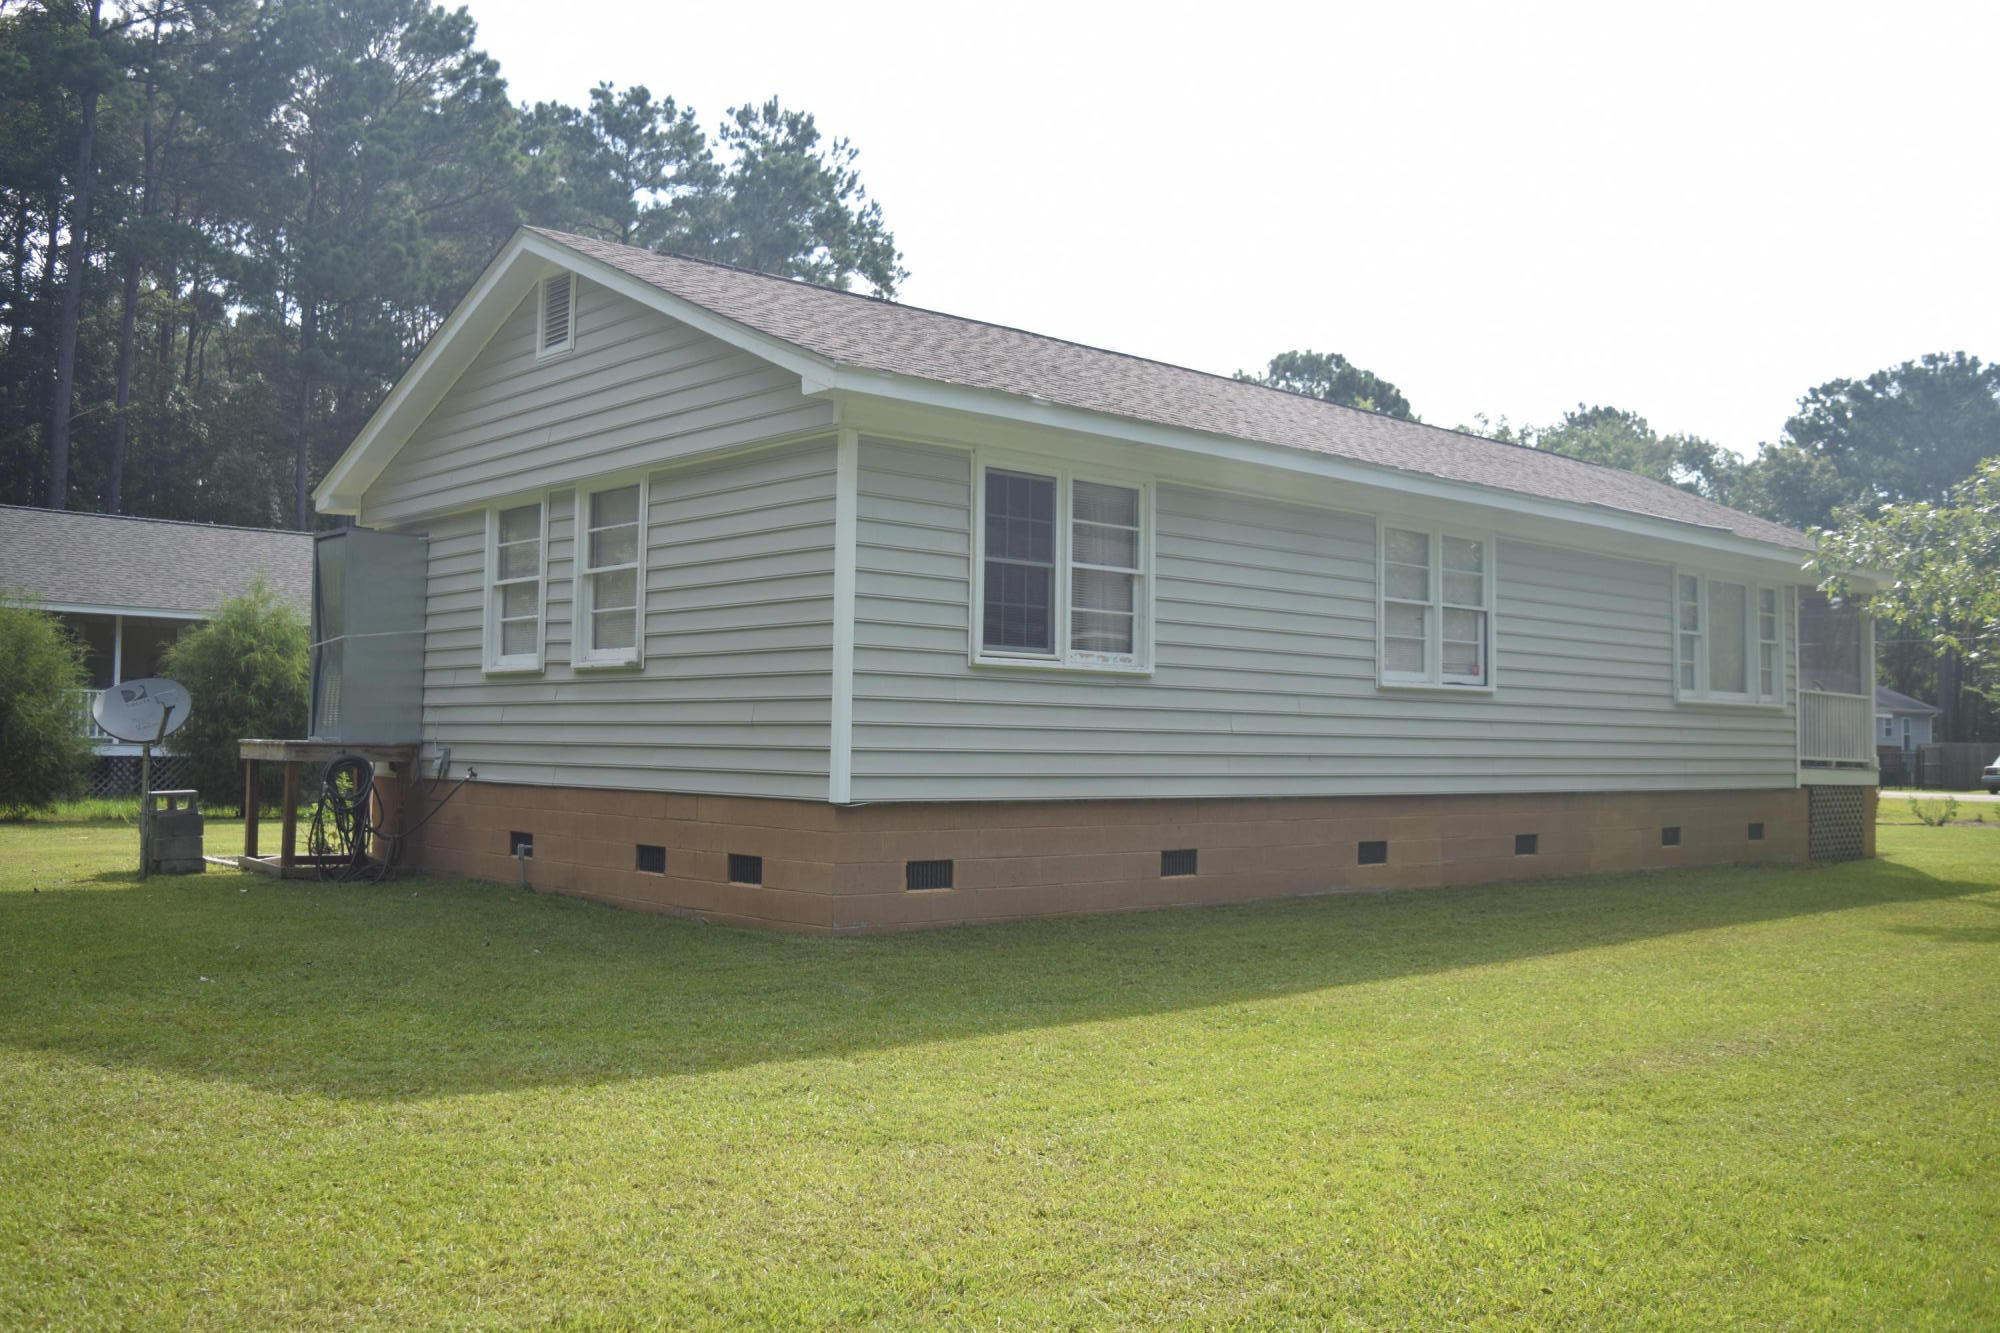 Ravenel Acres Homes For Sale - 2962 Bobo, Mount Pleasant, SC - 4